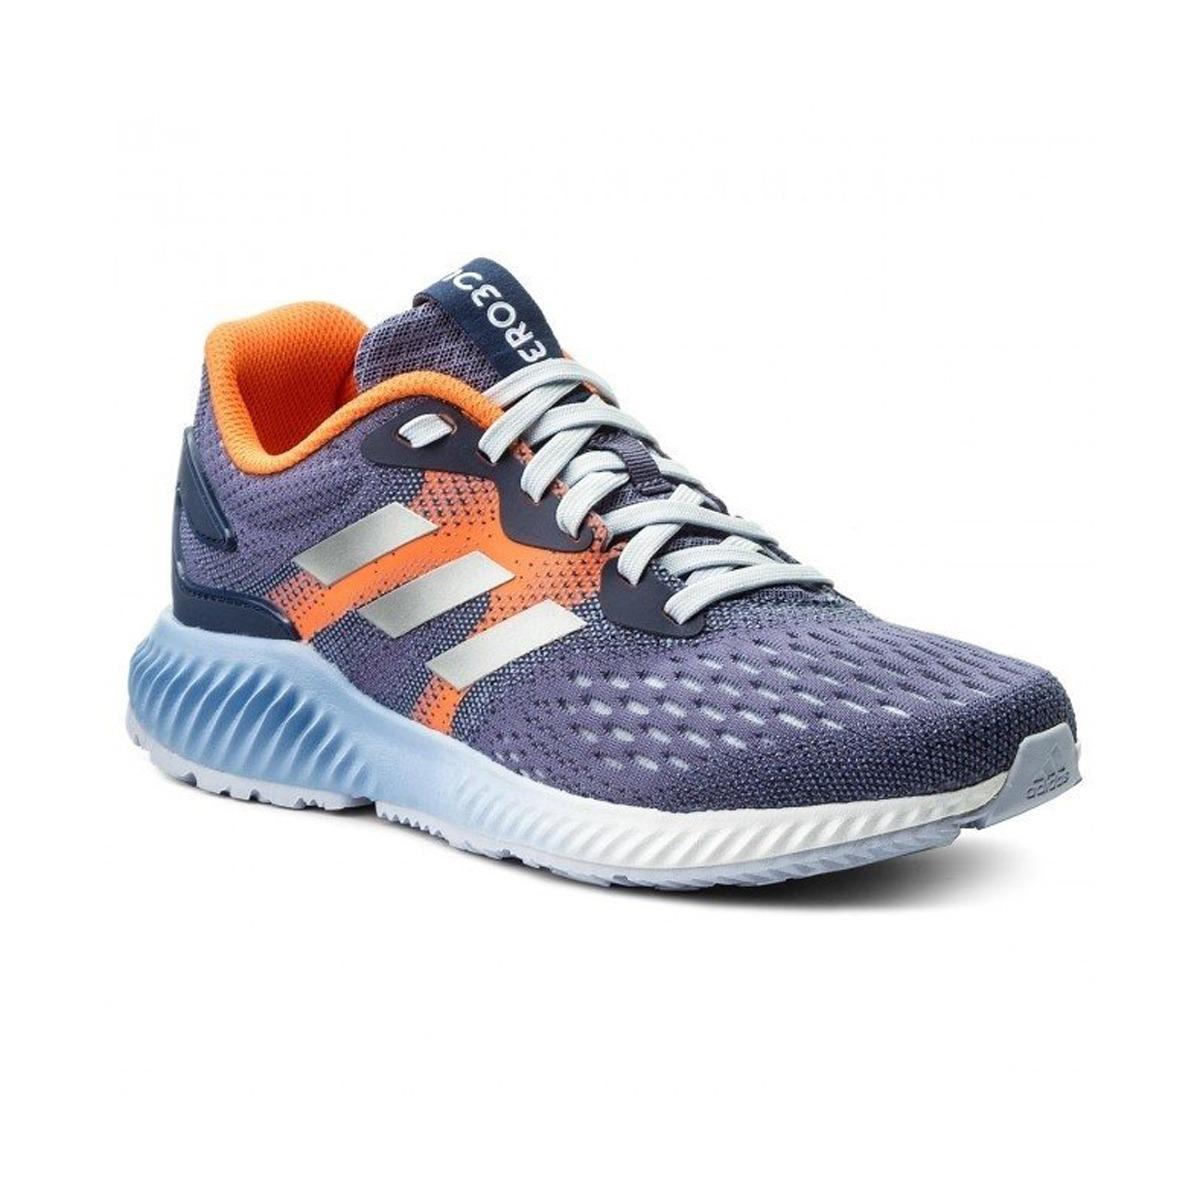 new concept 70ff1 f35fa Cargando zoom... zapatillas adidas running aerobounce w ...